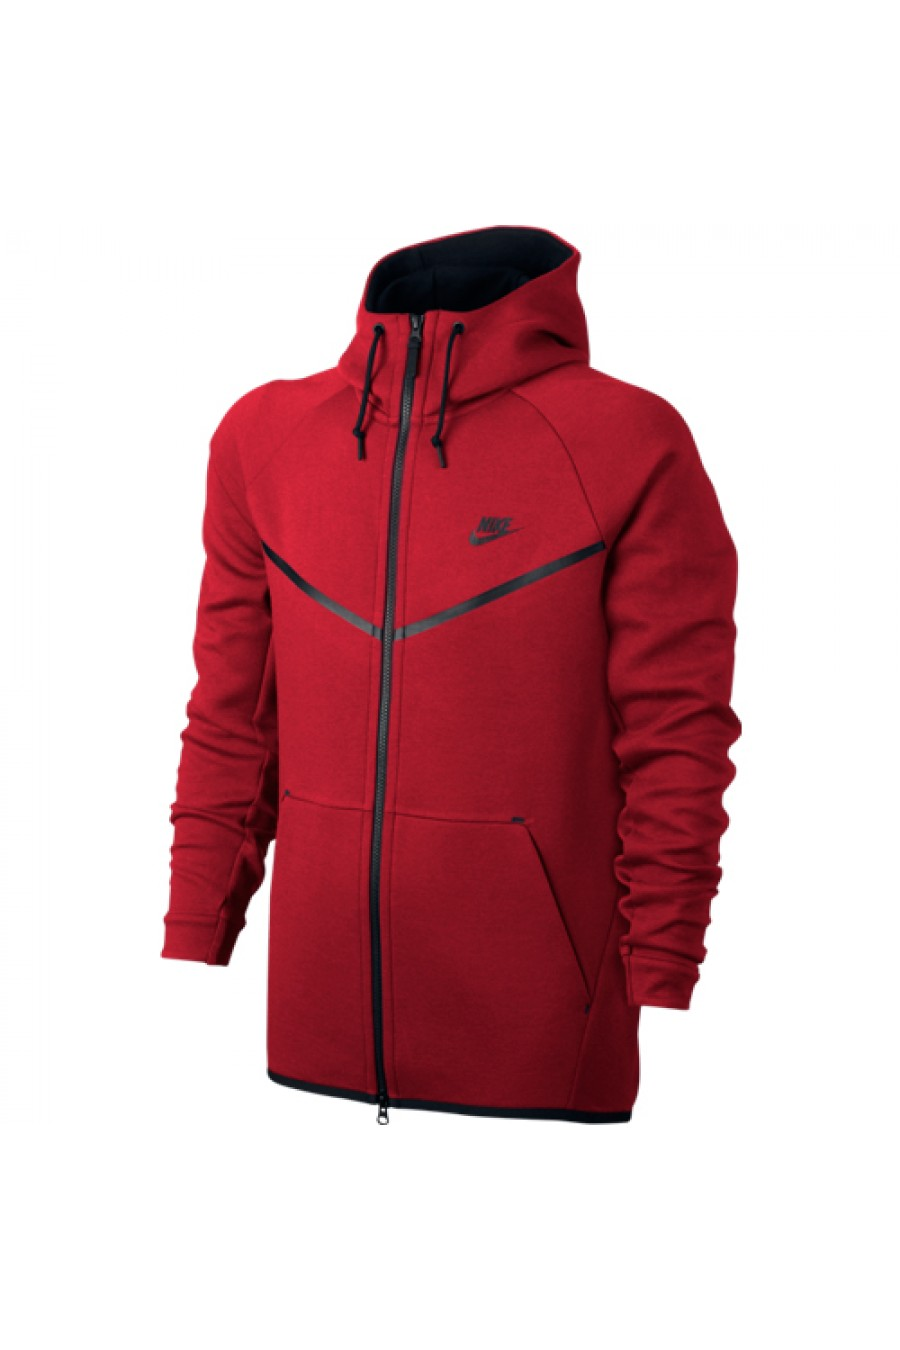 Veste rouge homme adidas